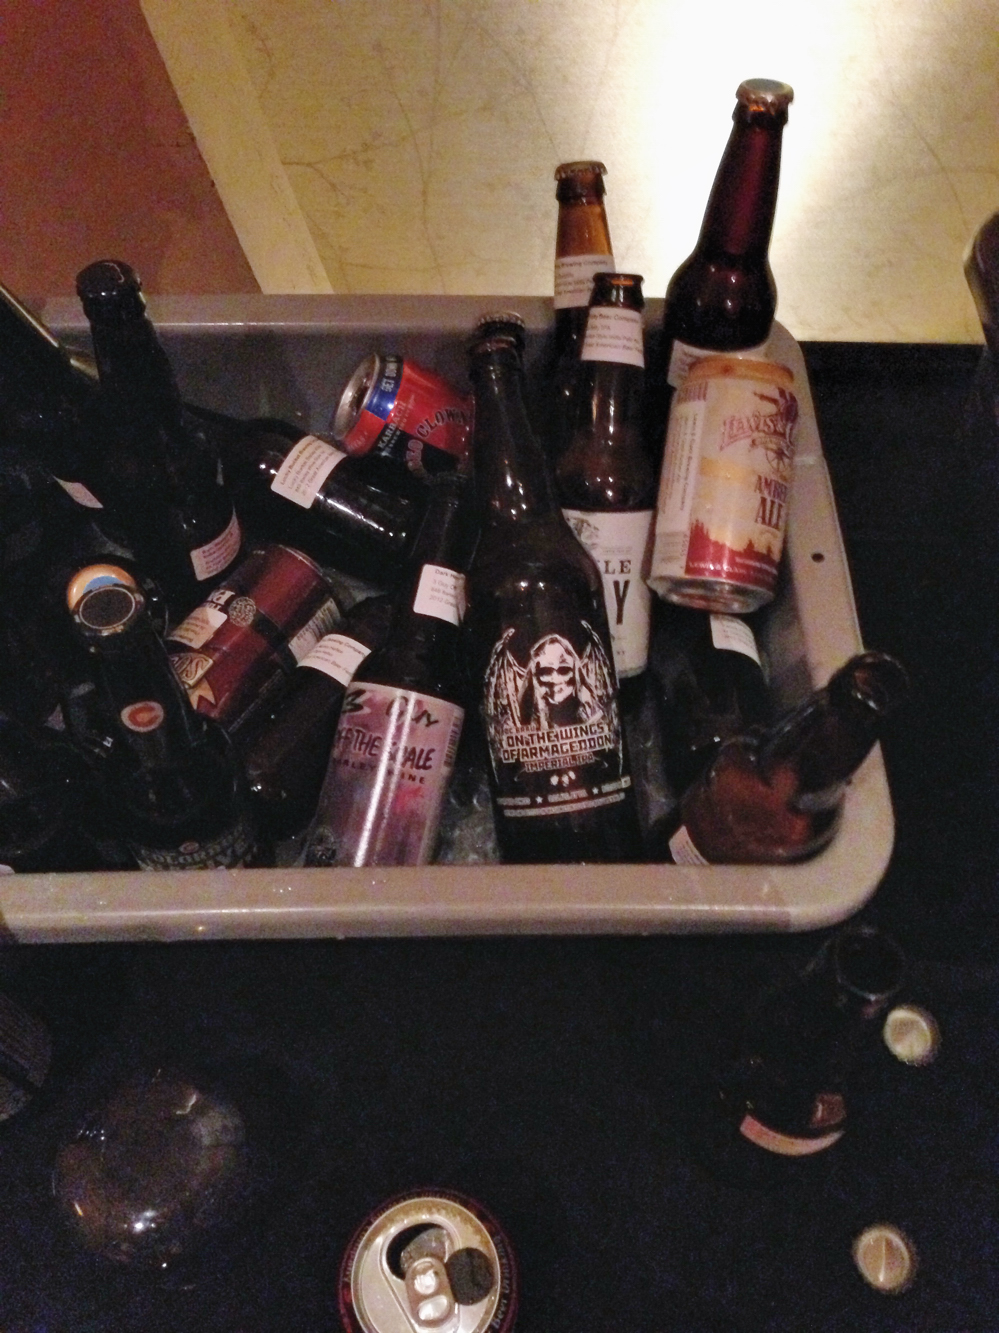 The Basement 'Dead Soldier' Bottle Share